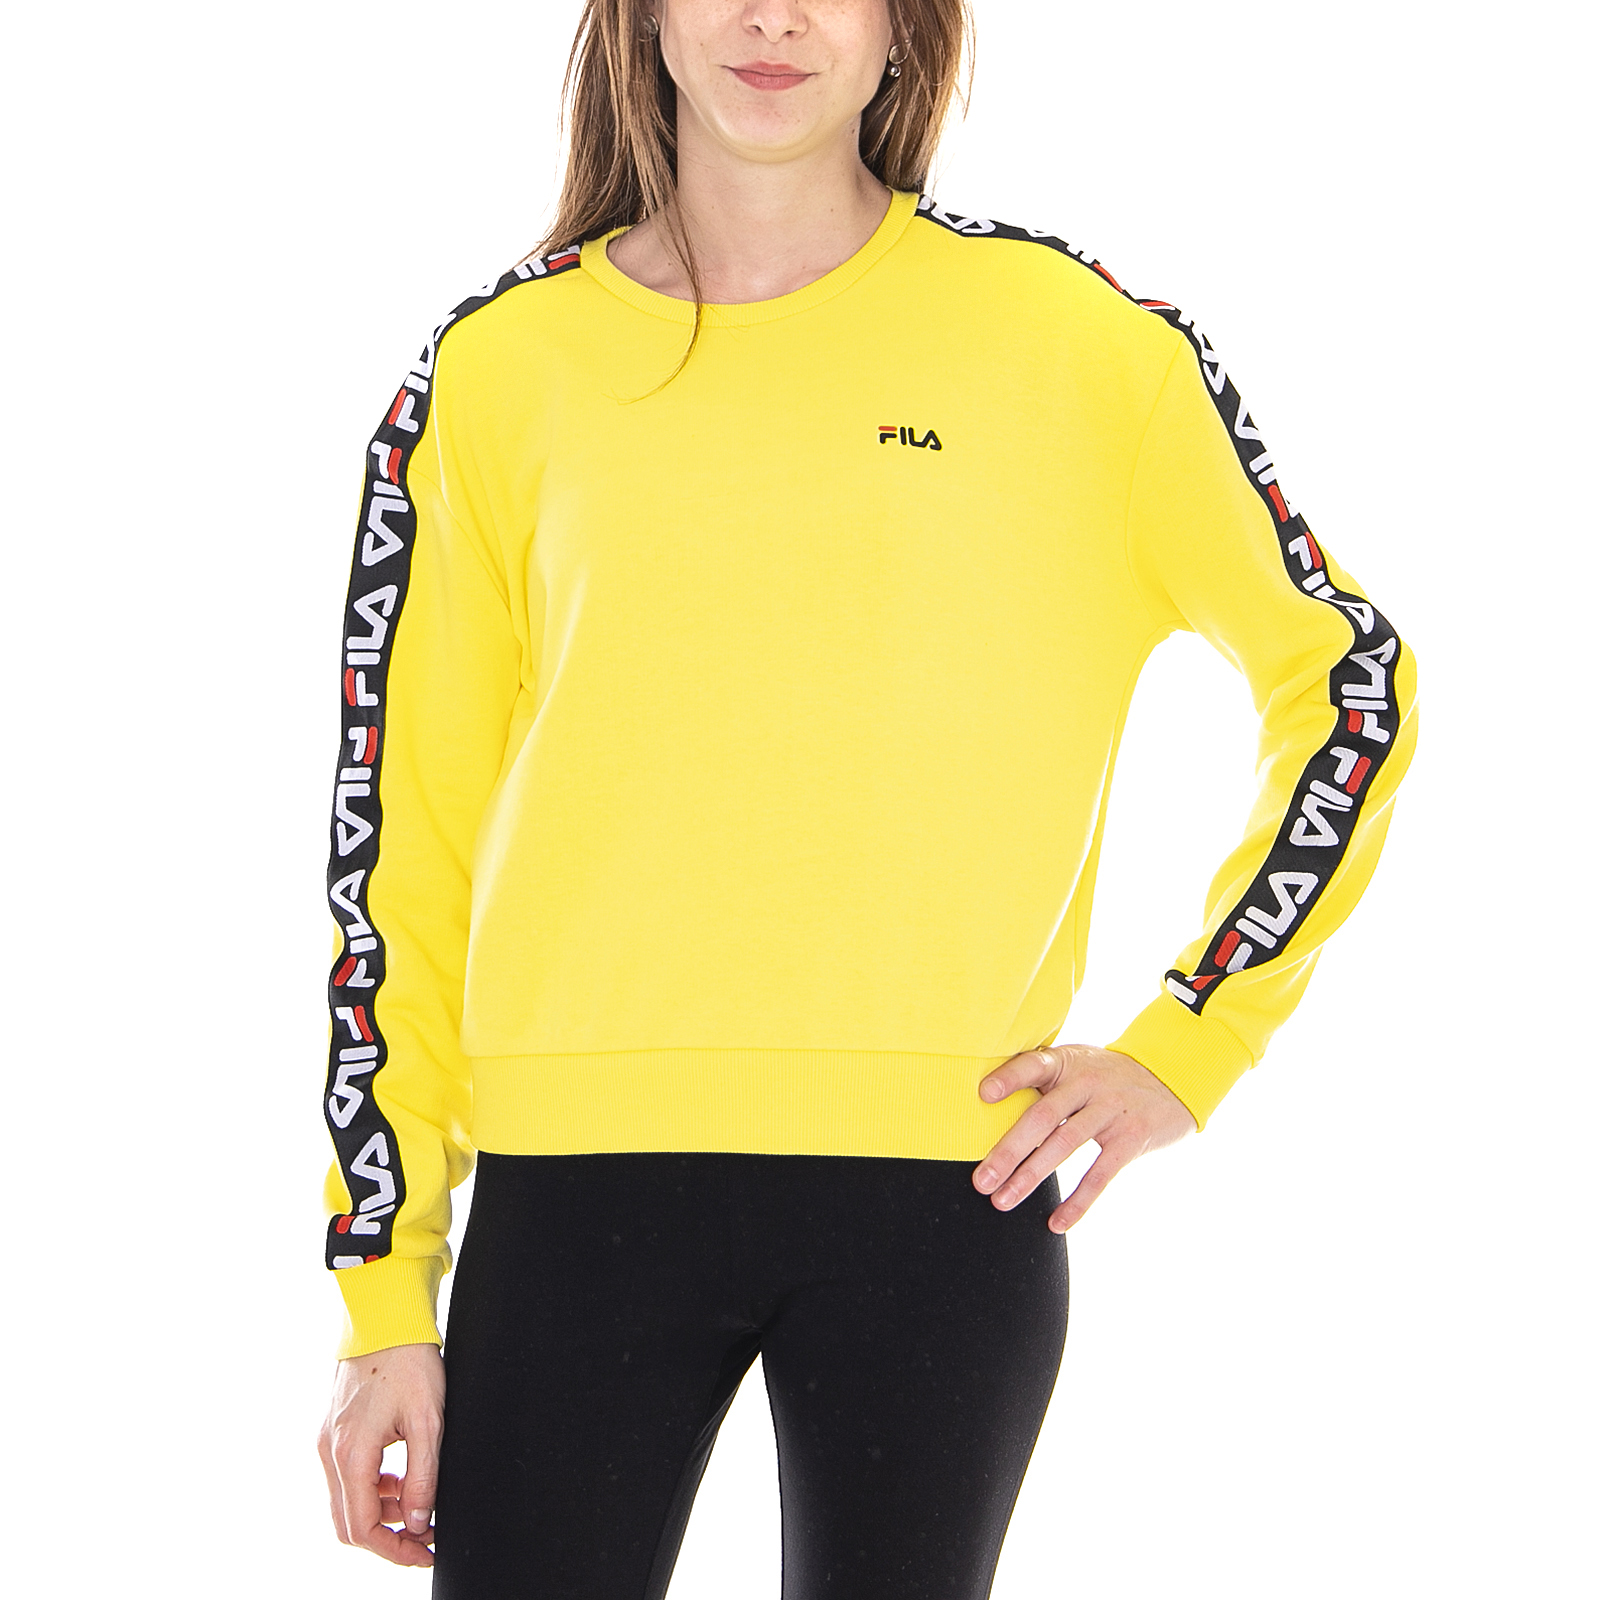 Fila Sweatshirts Women Tivka Crew Sweat Vibrant Yellow Yellow  f92a353c18